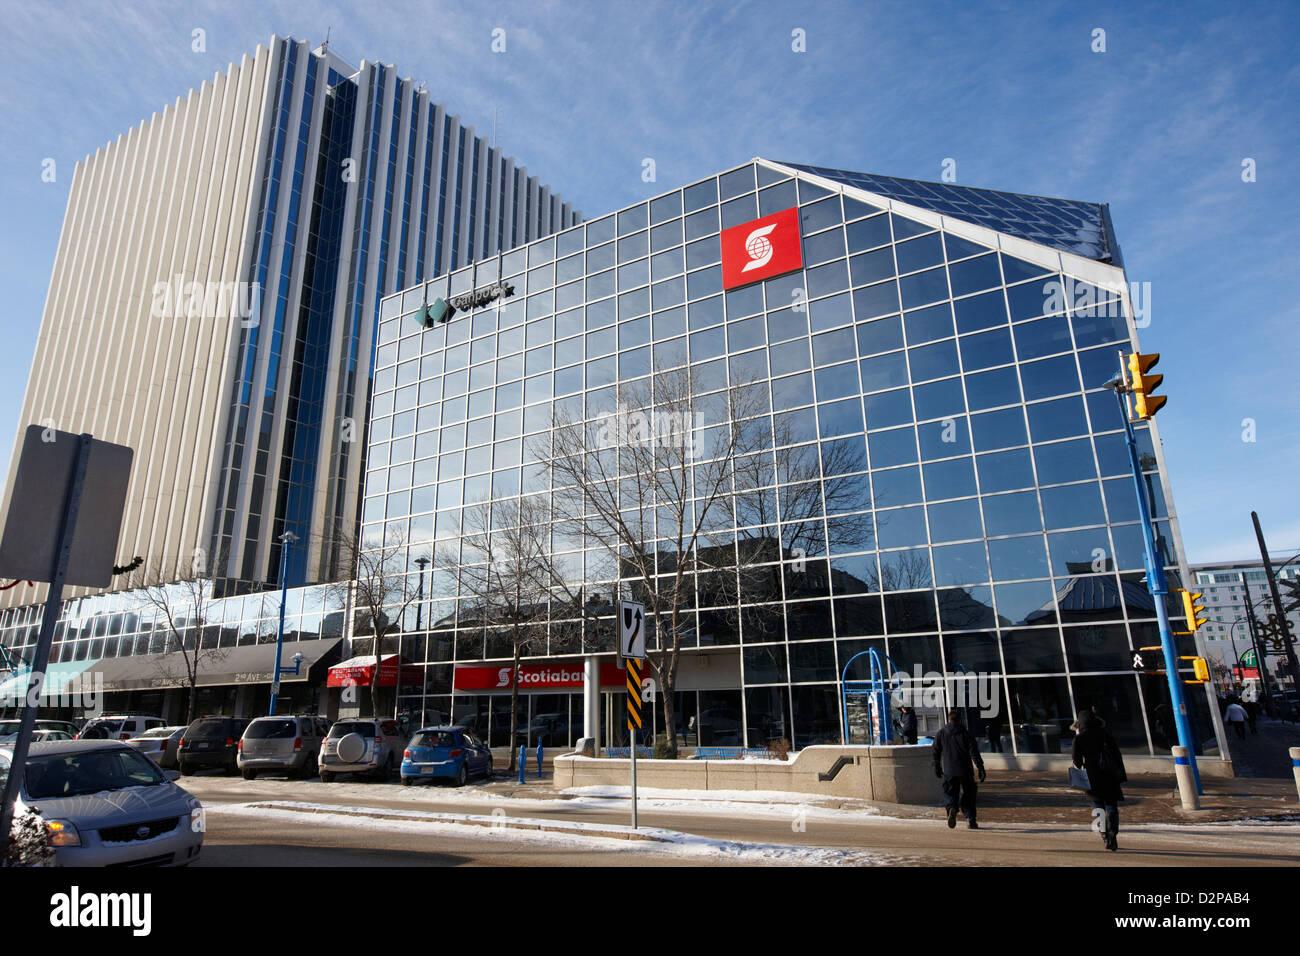 scotiabank scotia centre office towers and shopping mall Saskatoon Saskatchewan Canada - Stock Image